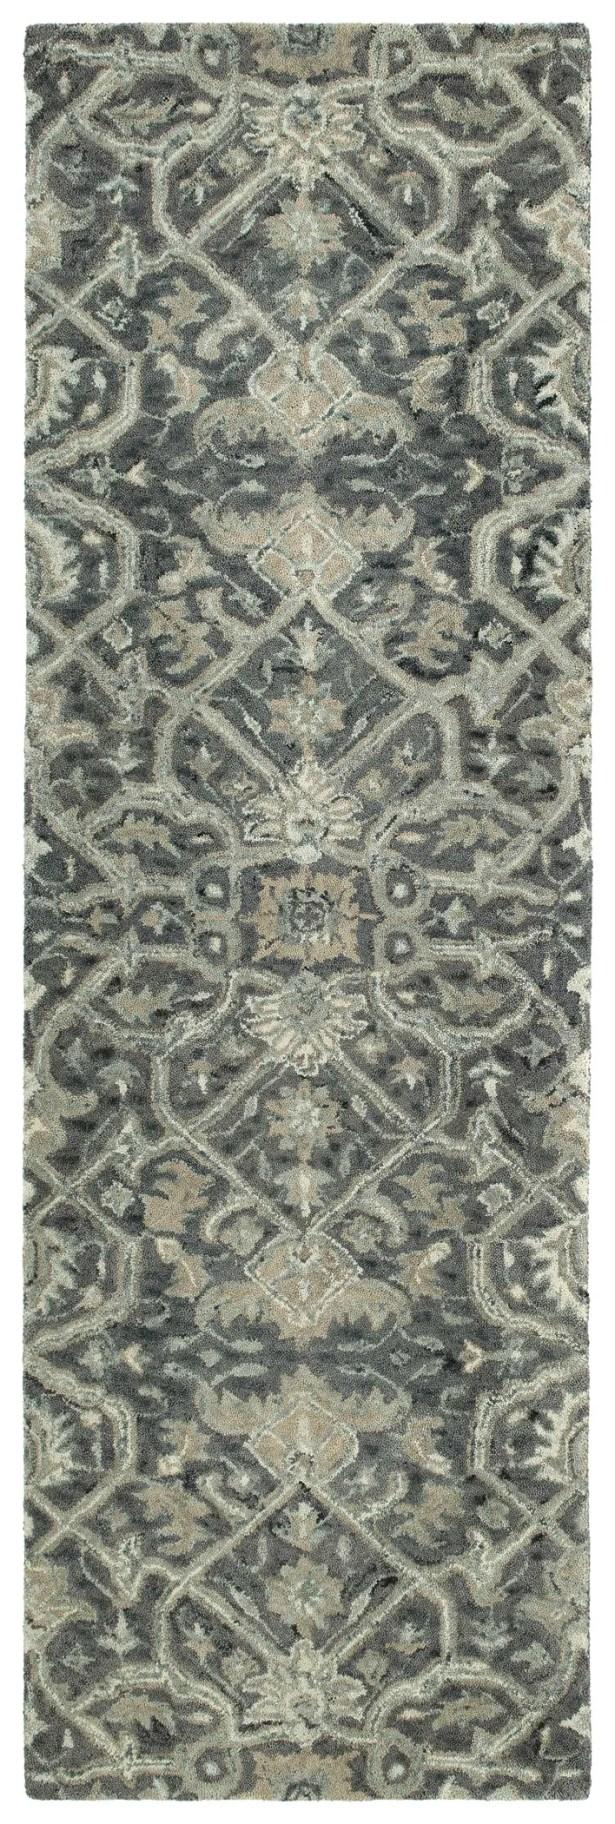 Toshiro Hand Tufted Wool Graphite Area Rug Rug Size: Runner 2'6